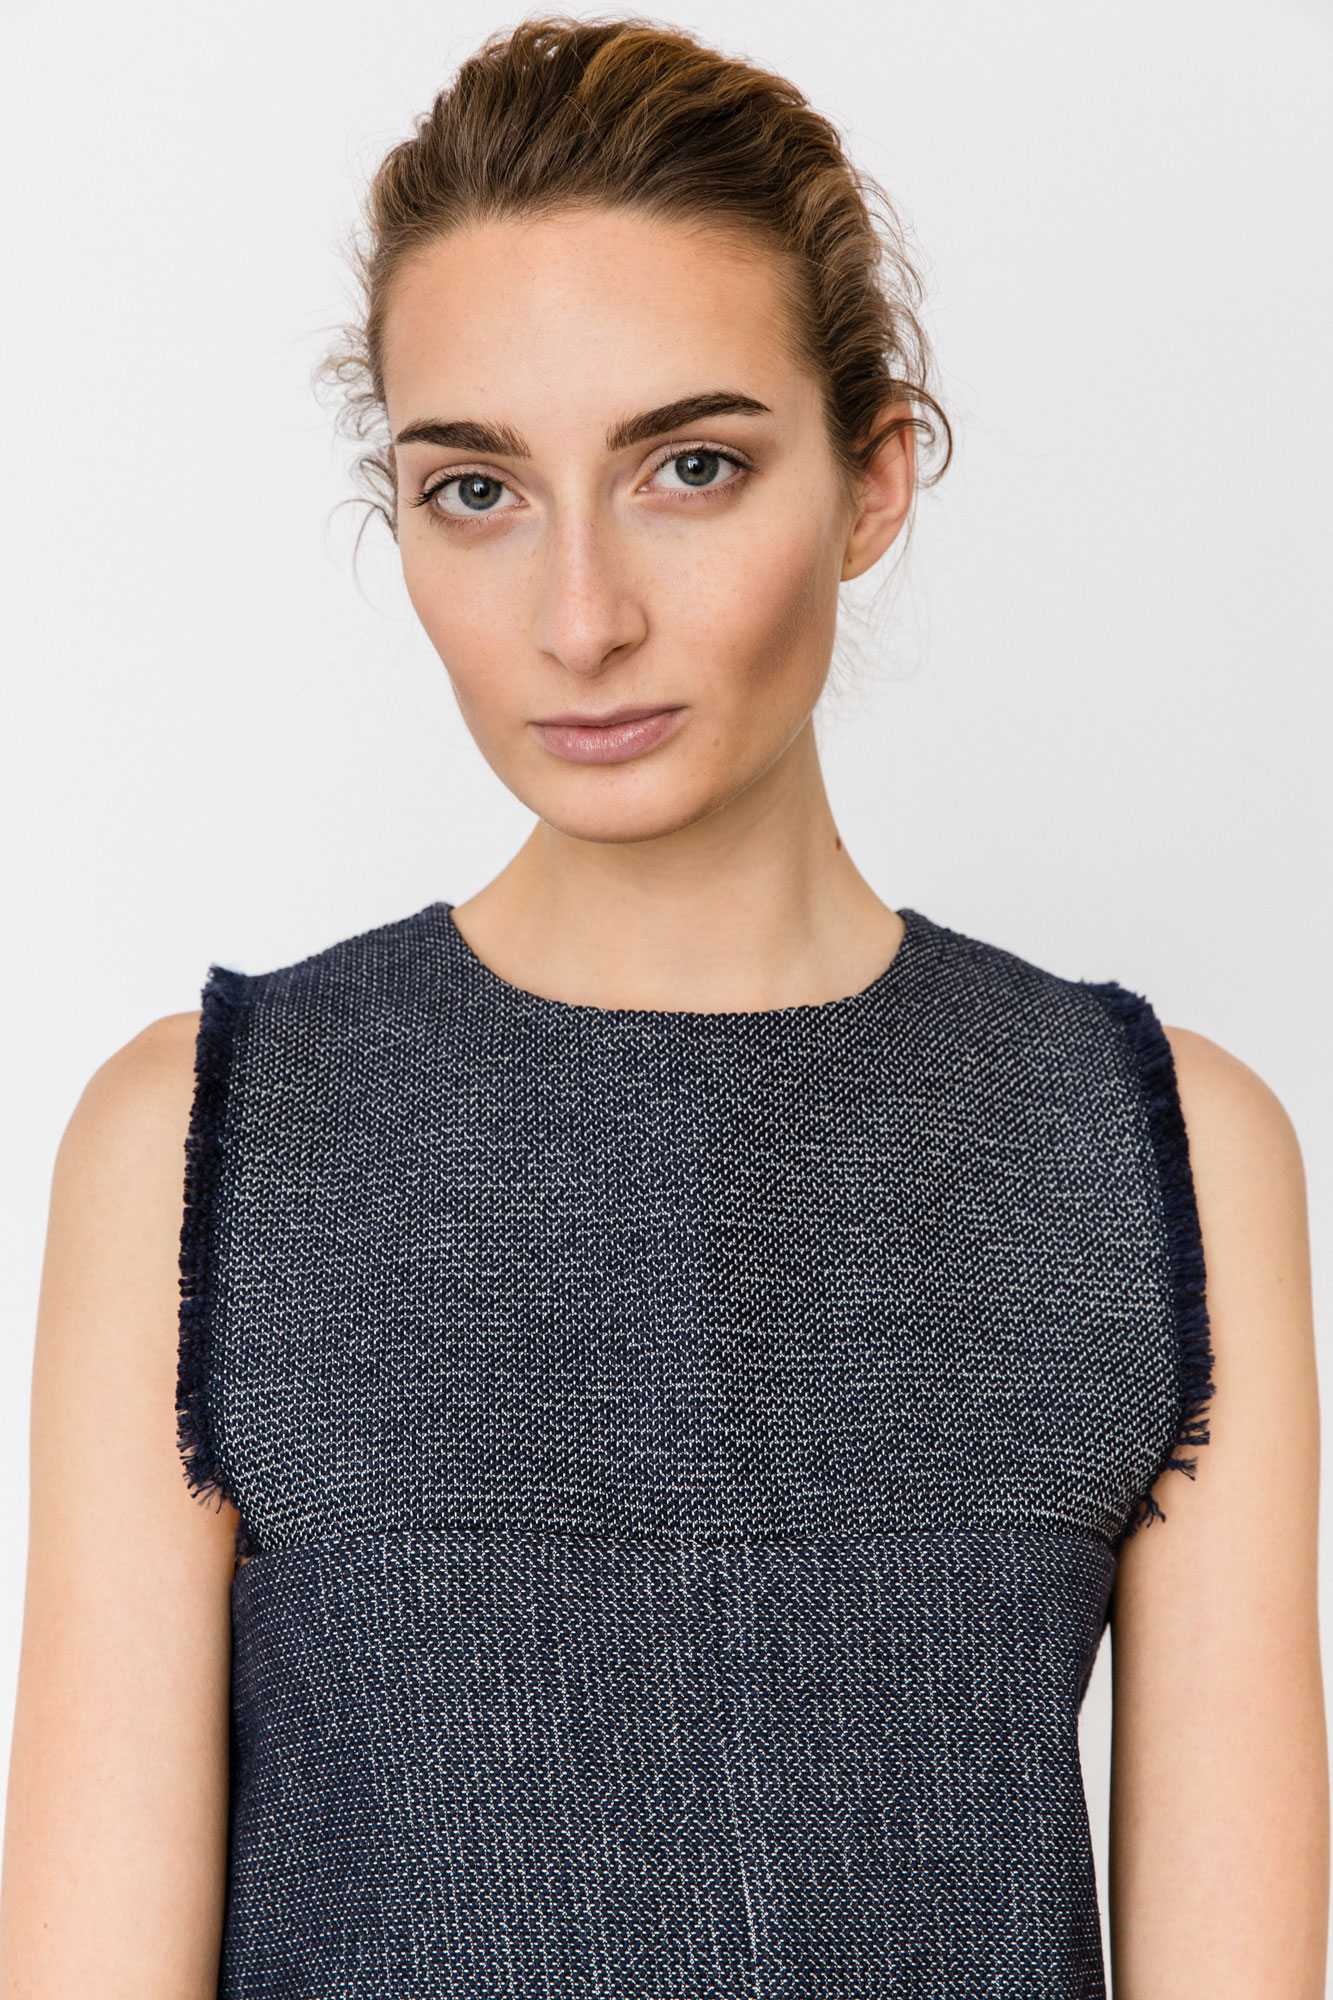 S18-09Plica_Dress2